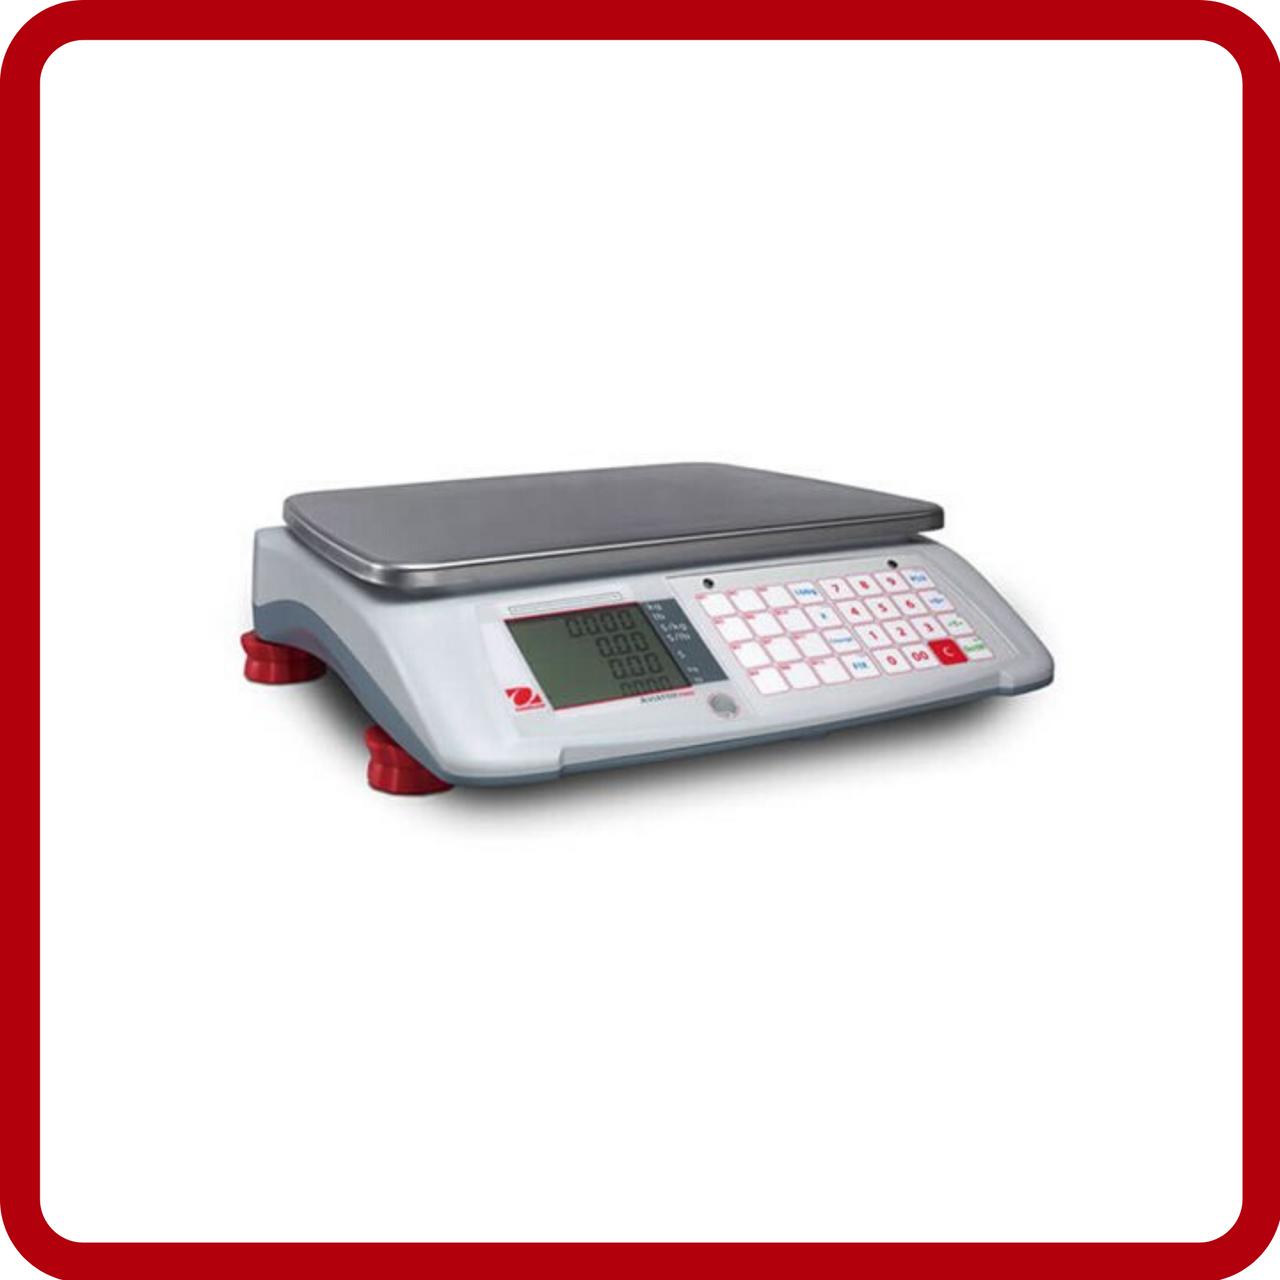 NTEP Price Computing Scales